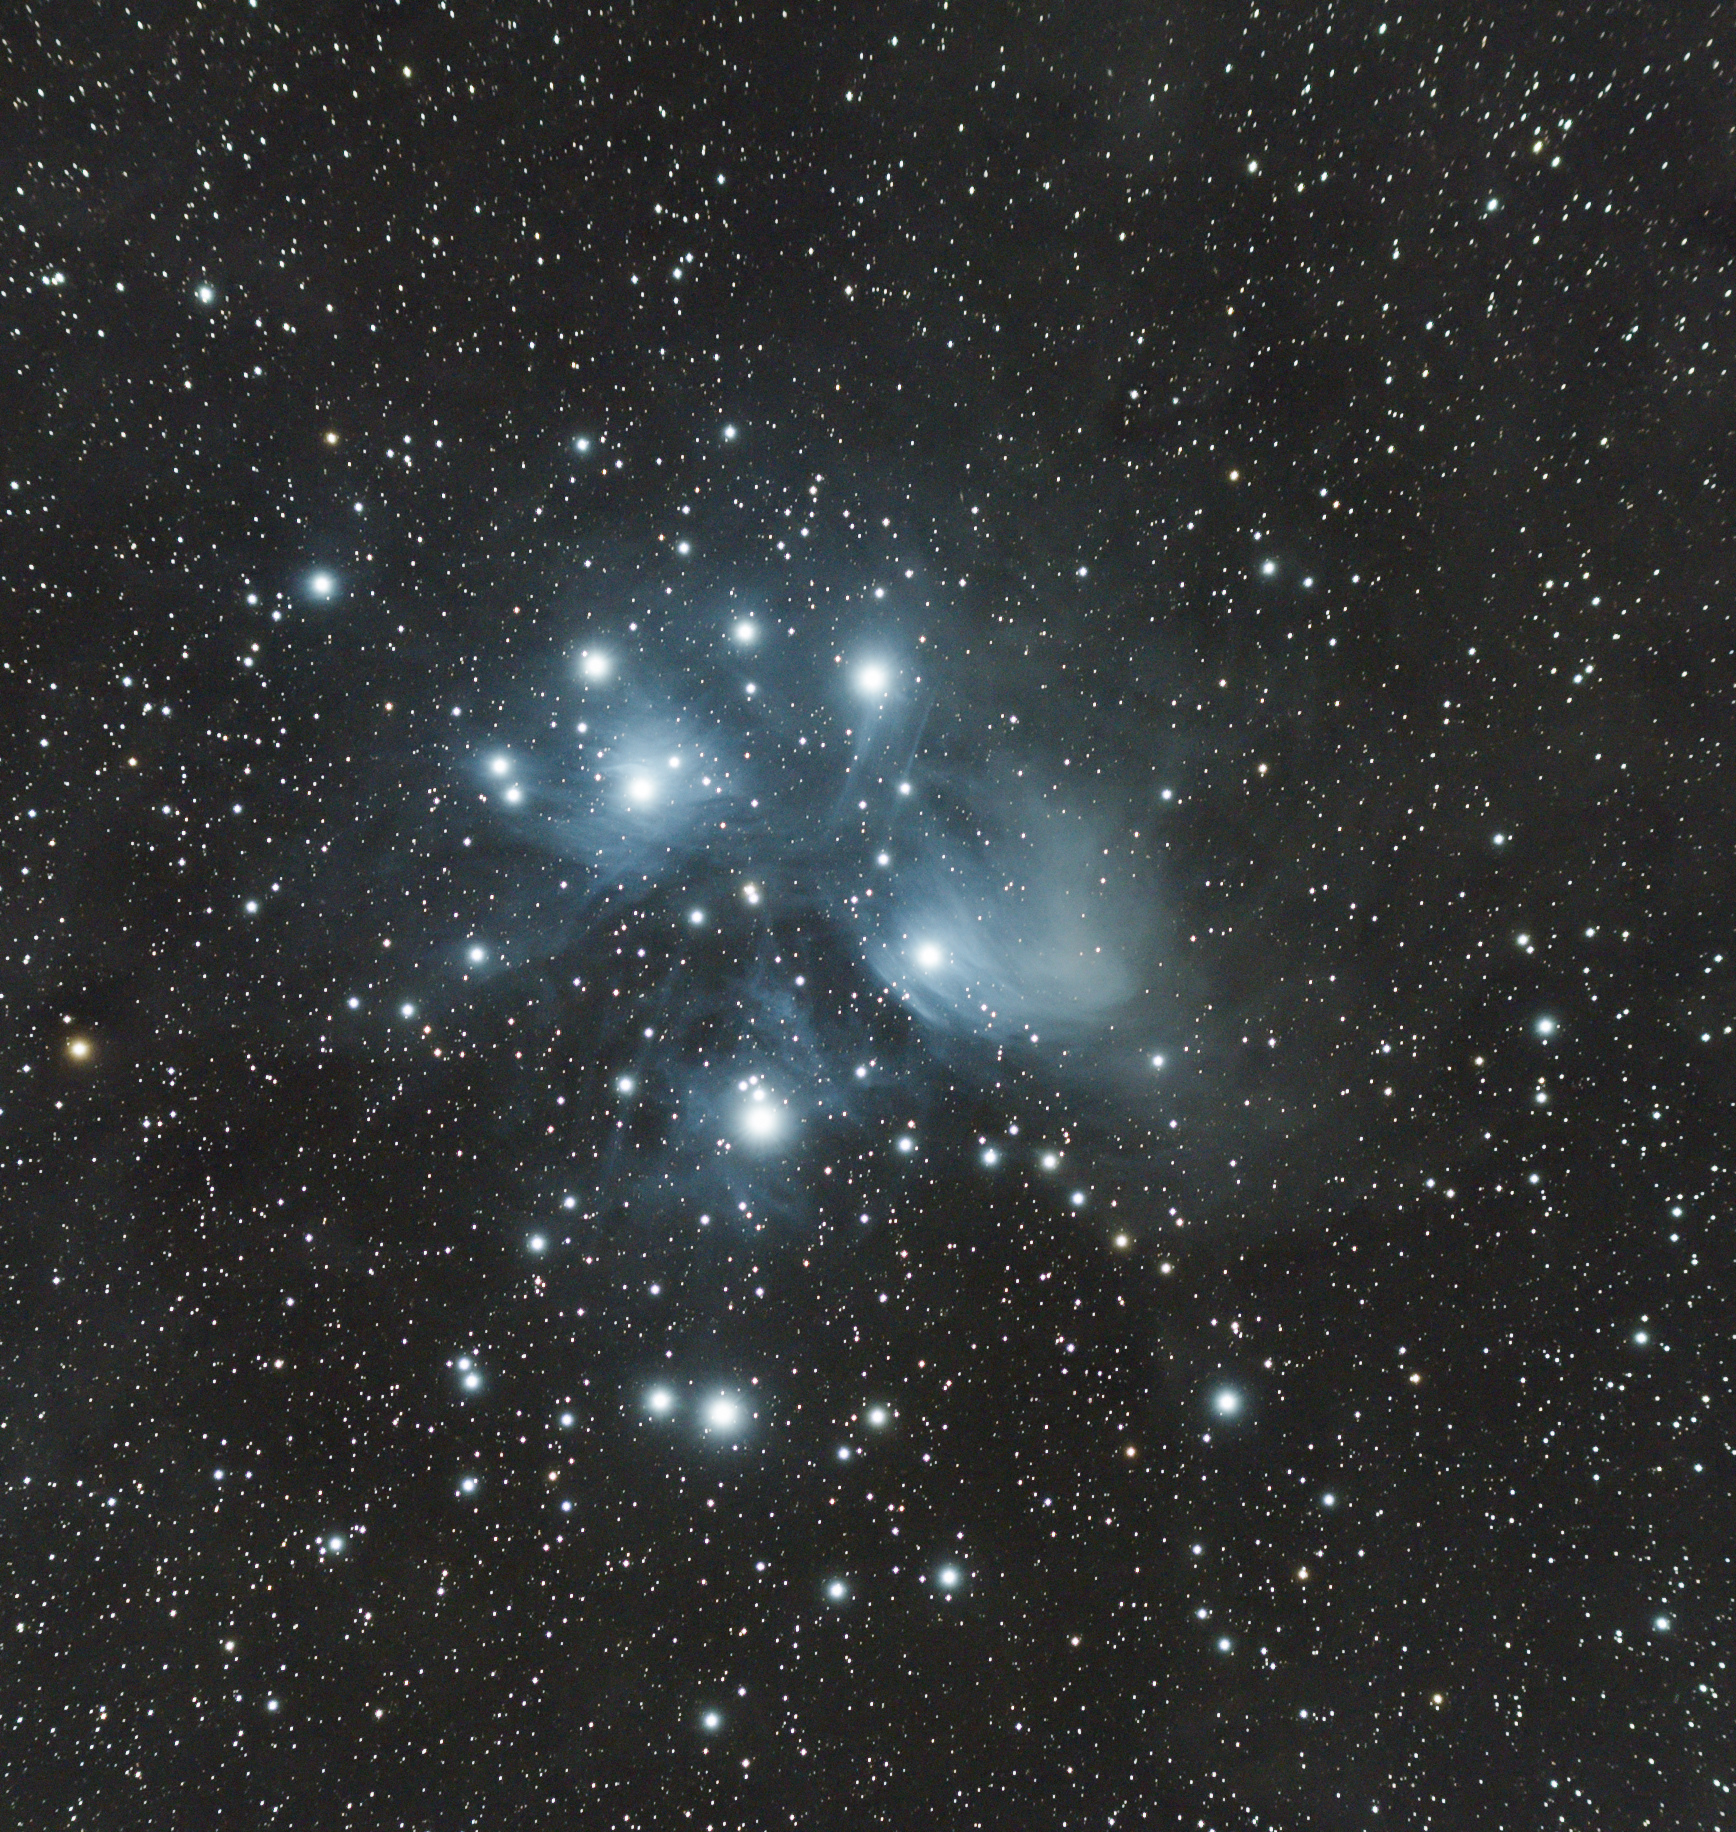 M45_Taka_Flat.jpg.f64acf8a71dfc746ec2a05b59816d1b2.jpg